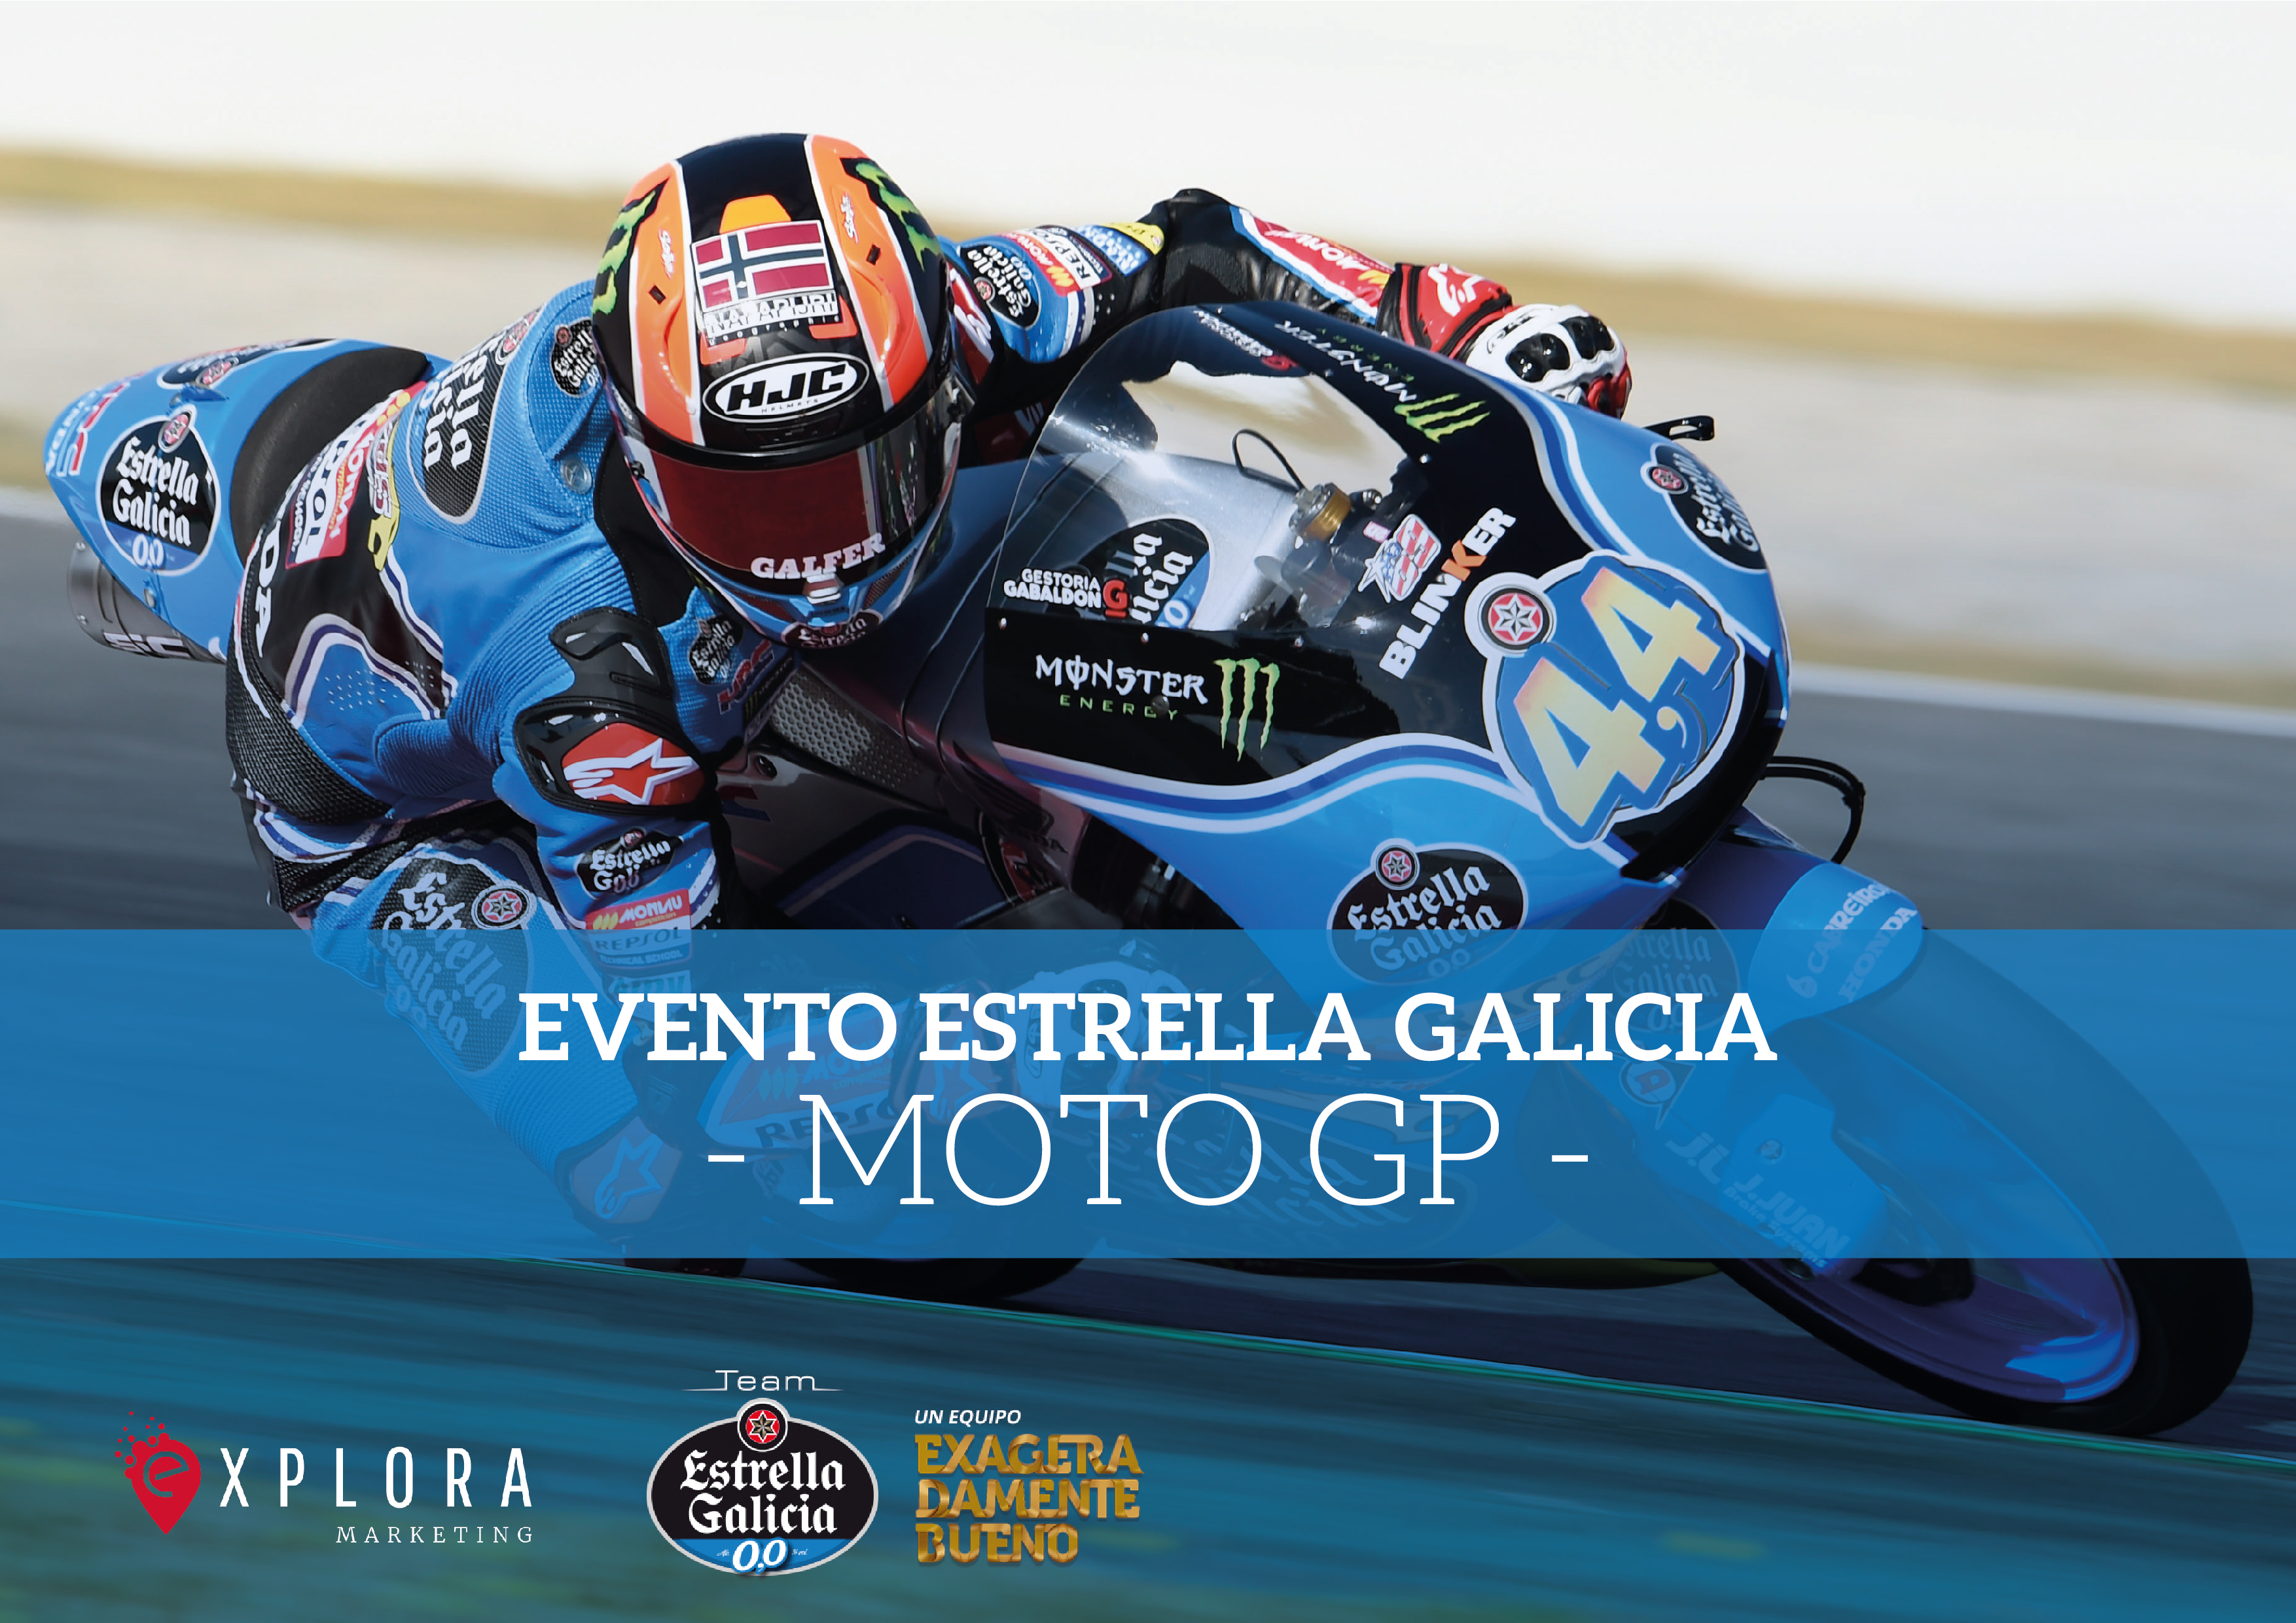 evento estrella galicia explora marketing